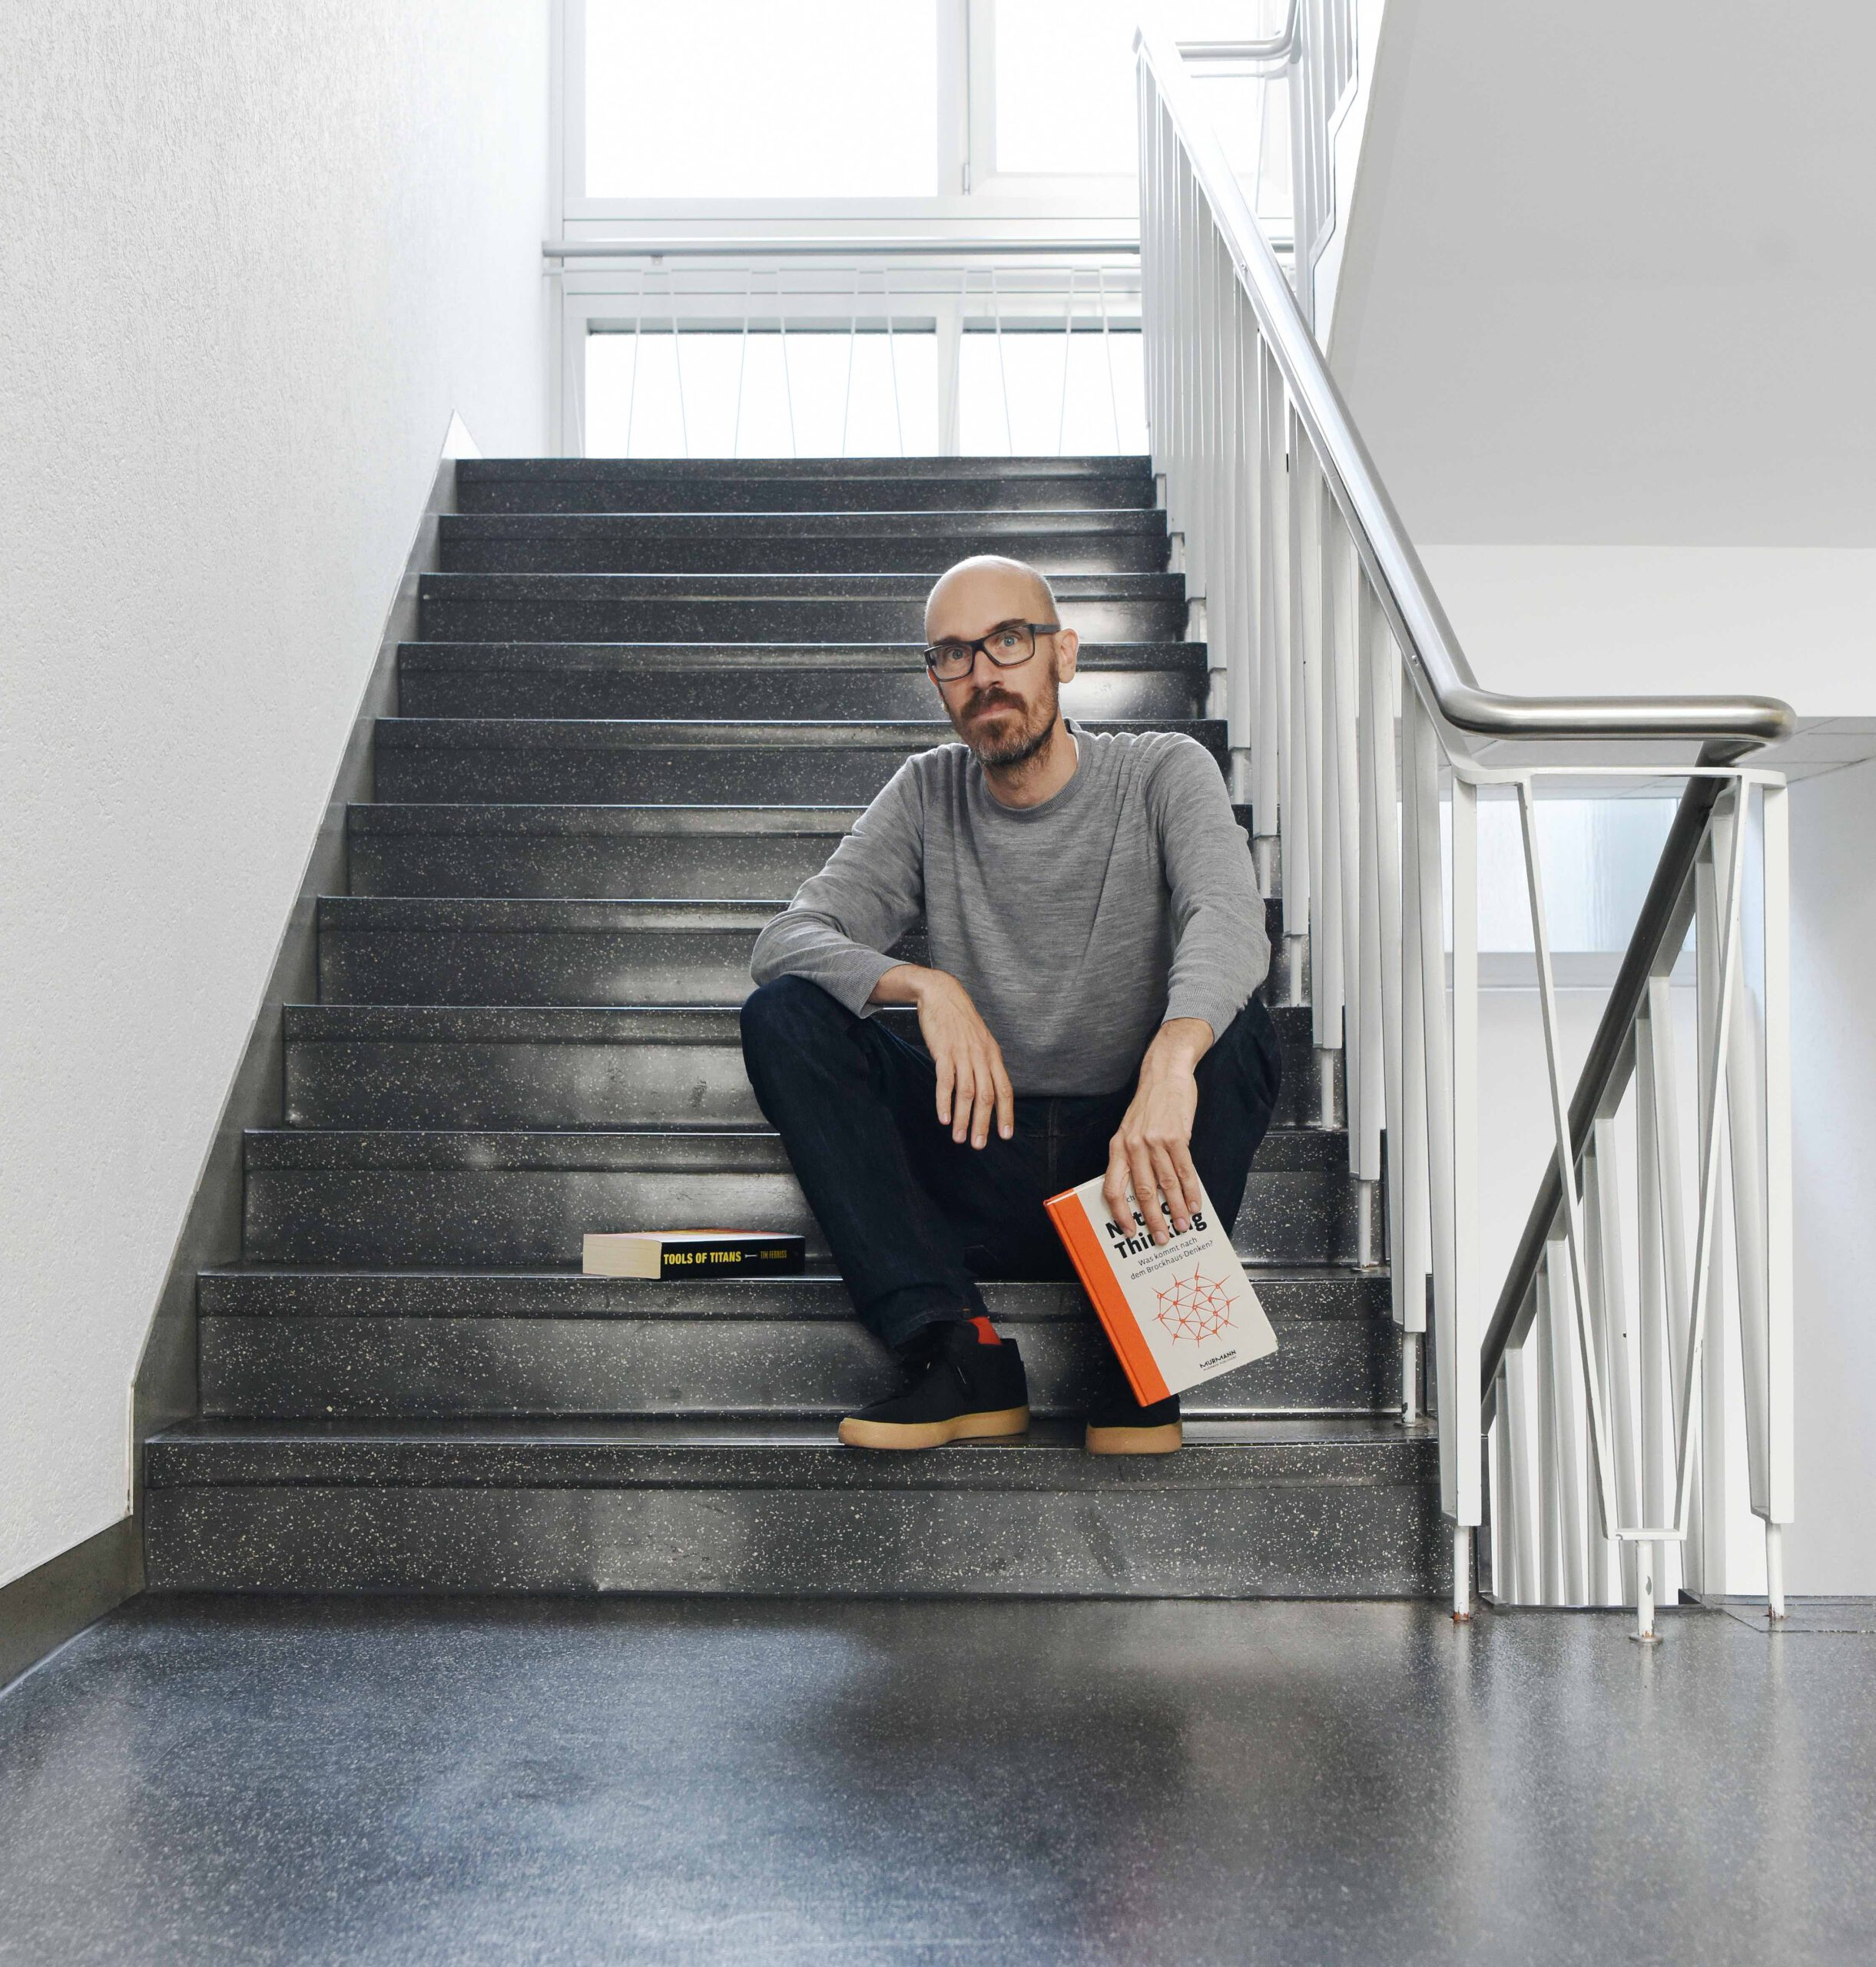 Benjamin Zierock - Startup - Entrepreneurship - Design